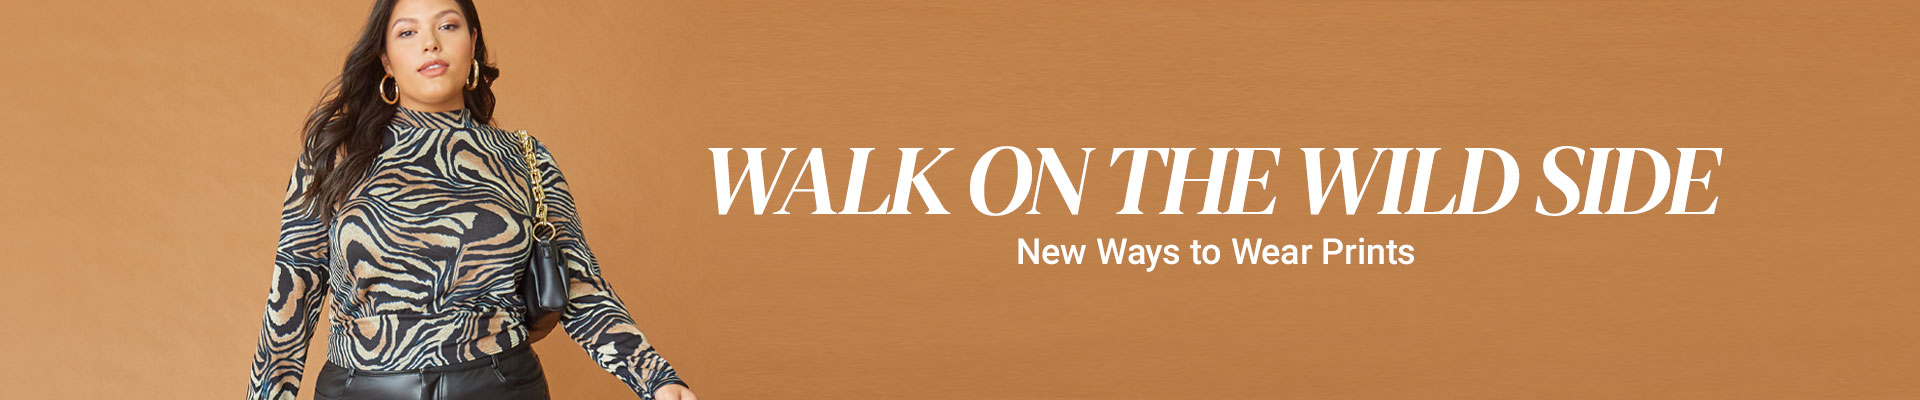 WALK ON THE WILD SIDE | New Ways to Wear Prints